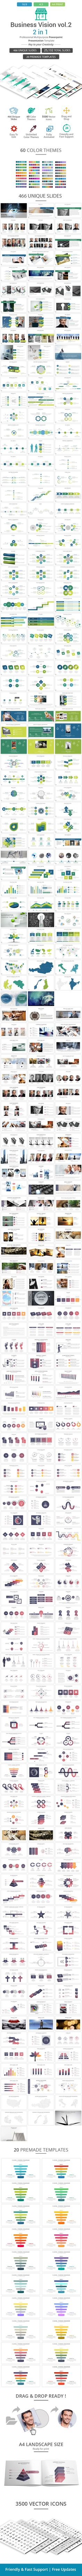 Business vision vol .2 2 in 1 PowerPoint Template Bundle  #ppt #portfolio • Download ➝ https://graphicriver.net/item/business-vision-vol-2-2-in-1-powerpoint-template-bundle/18283454?ref=pxcr